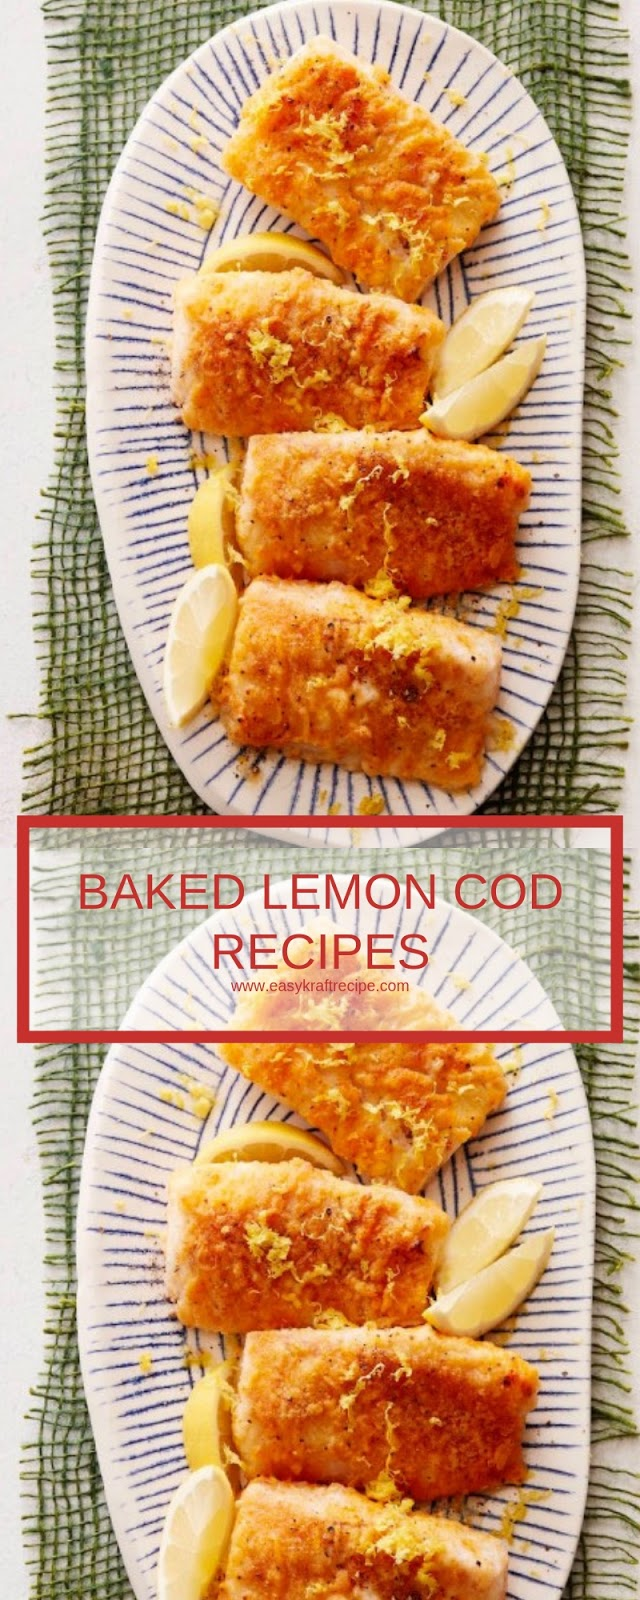 BAKED LEMON COD RECIPES